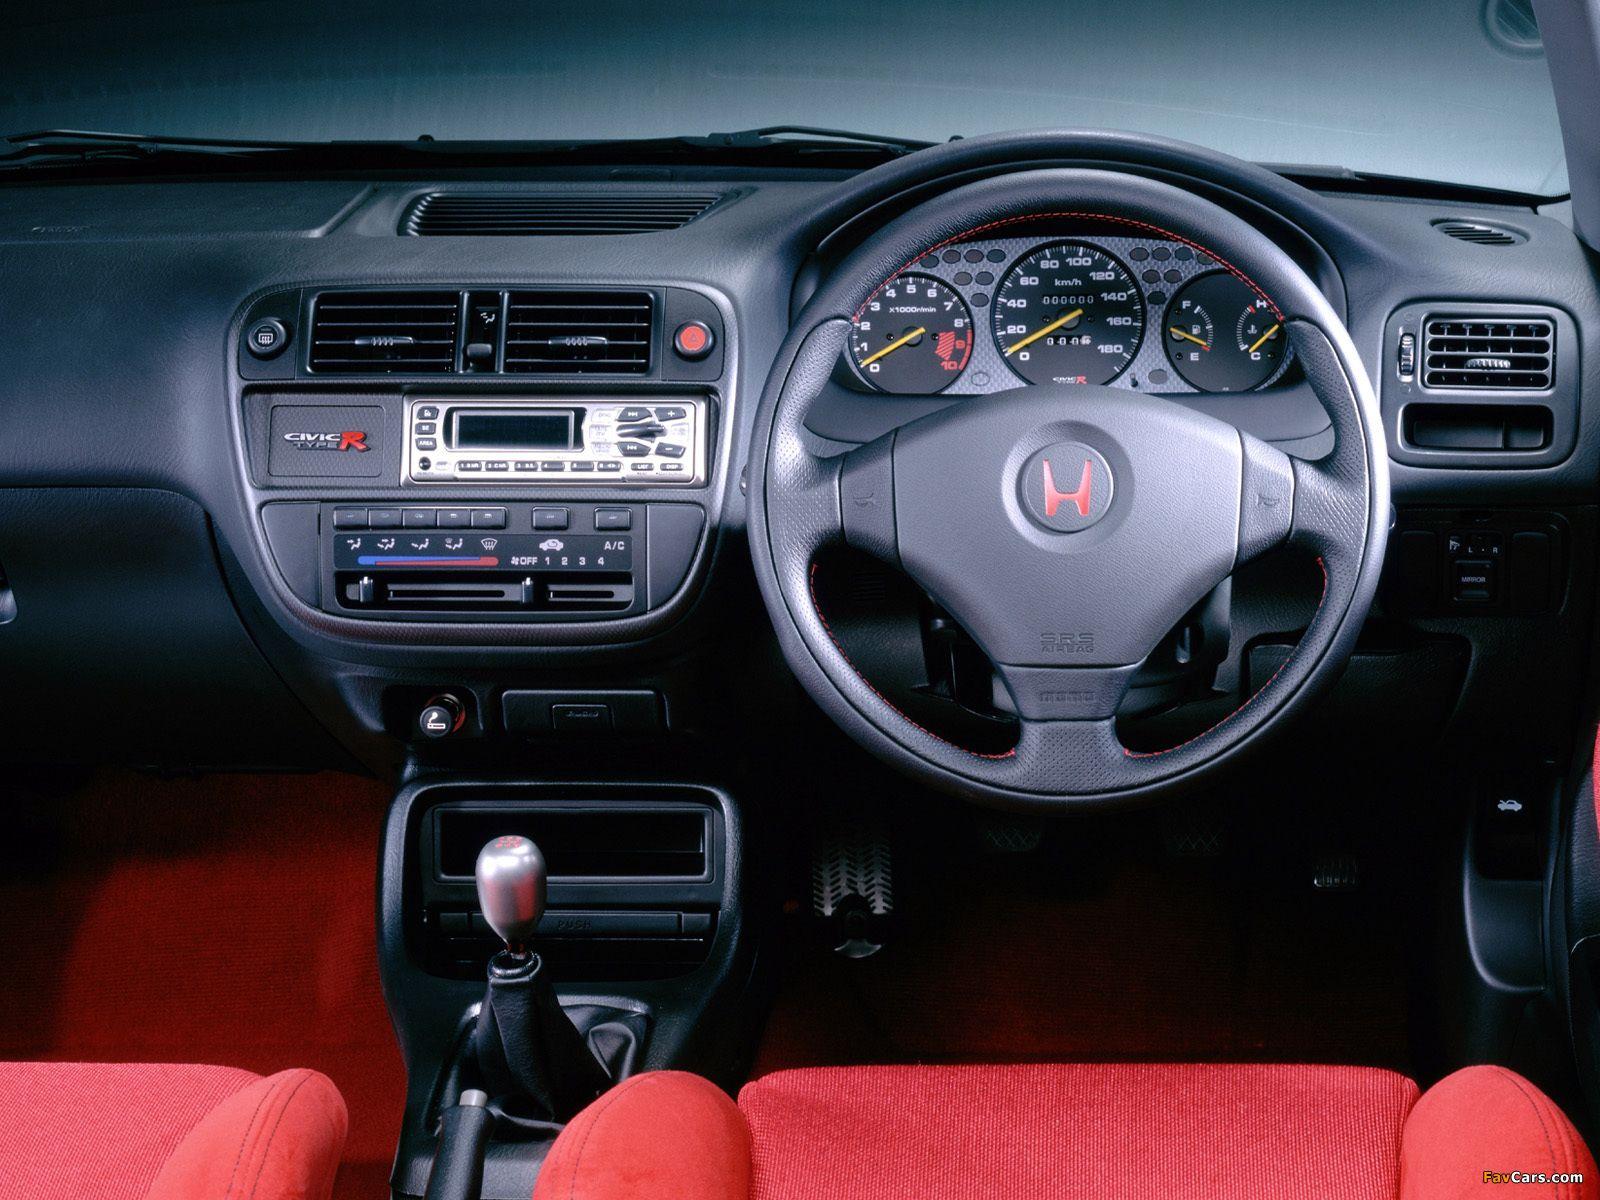 Honda Civic Type R Ek9 1997 2000 2000 Honda Civic Honda Civic Honda Civic Type R